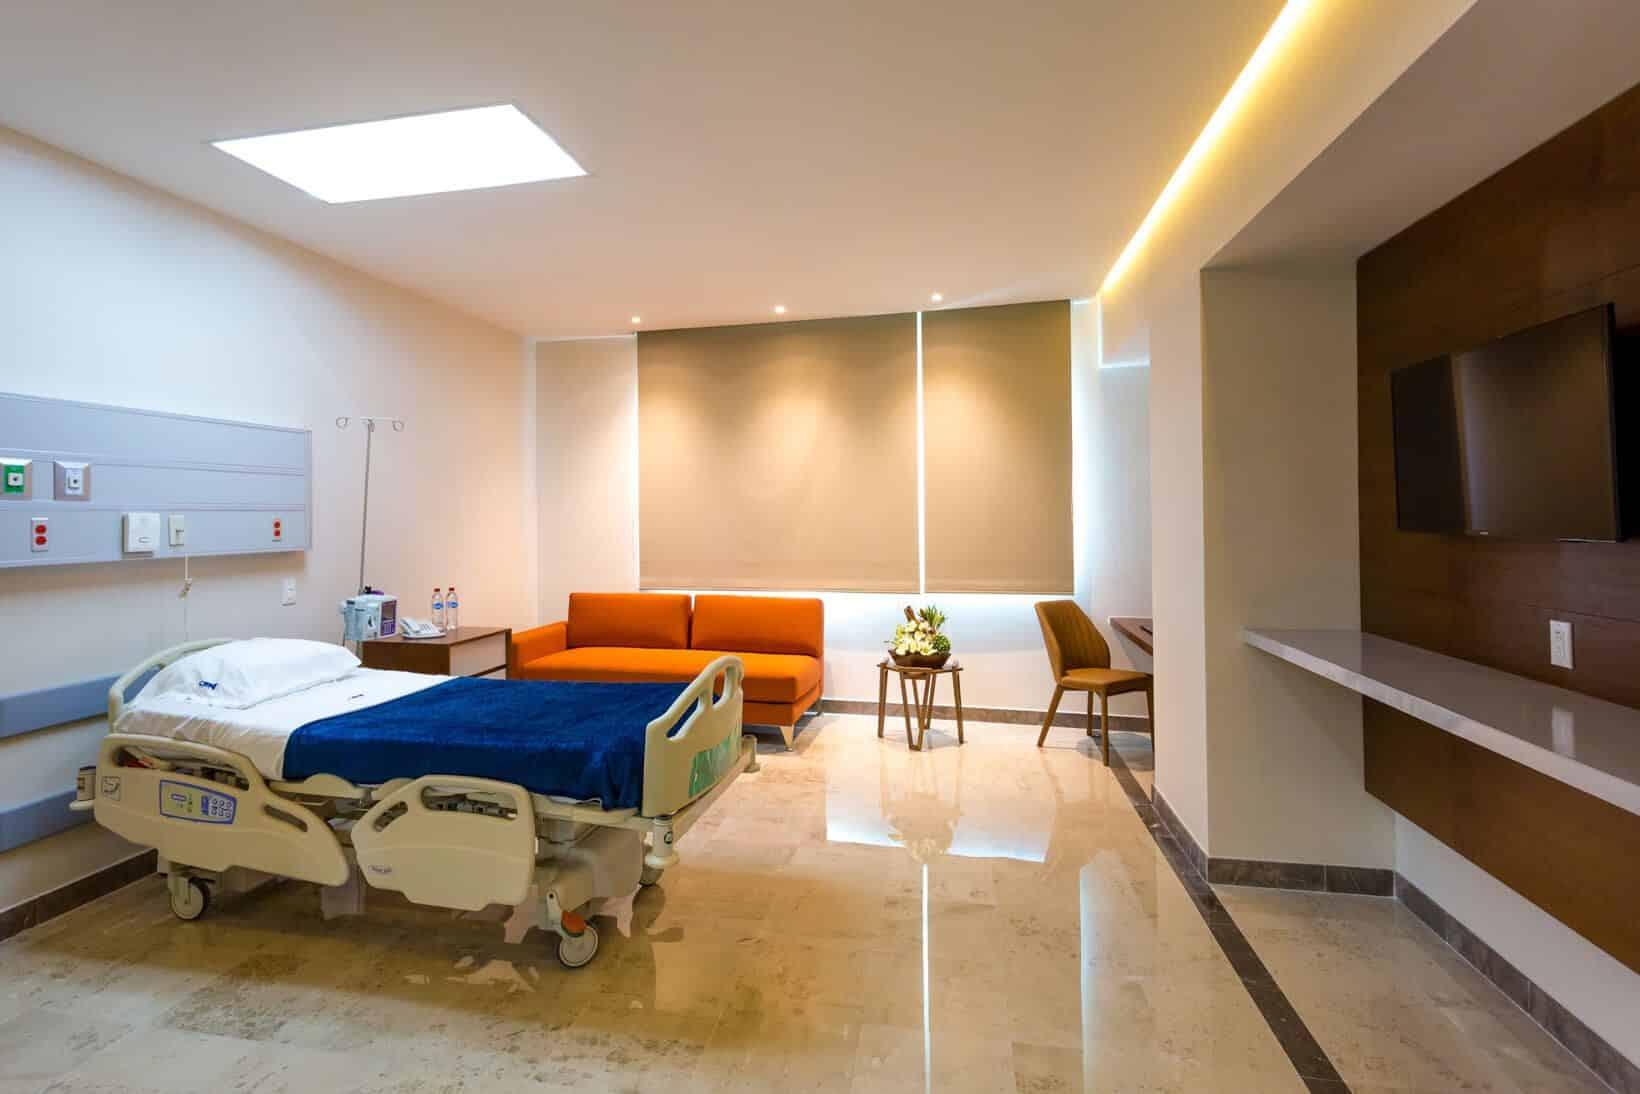 Suite Hospital CMQ Riviera NayaritSuite Hospital CMQ Riviera Nayarit